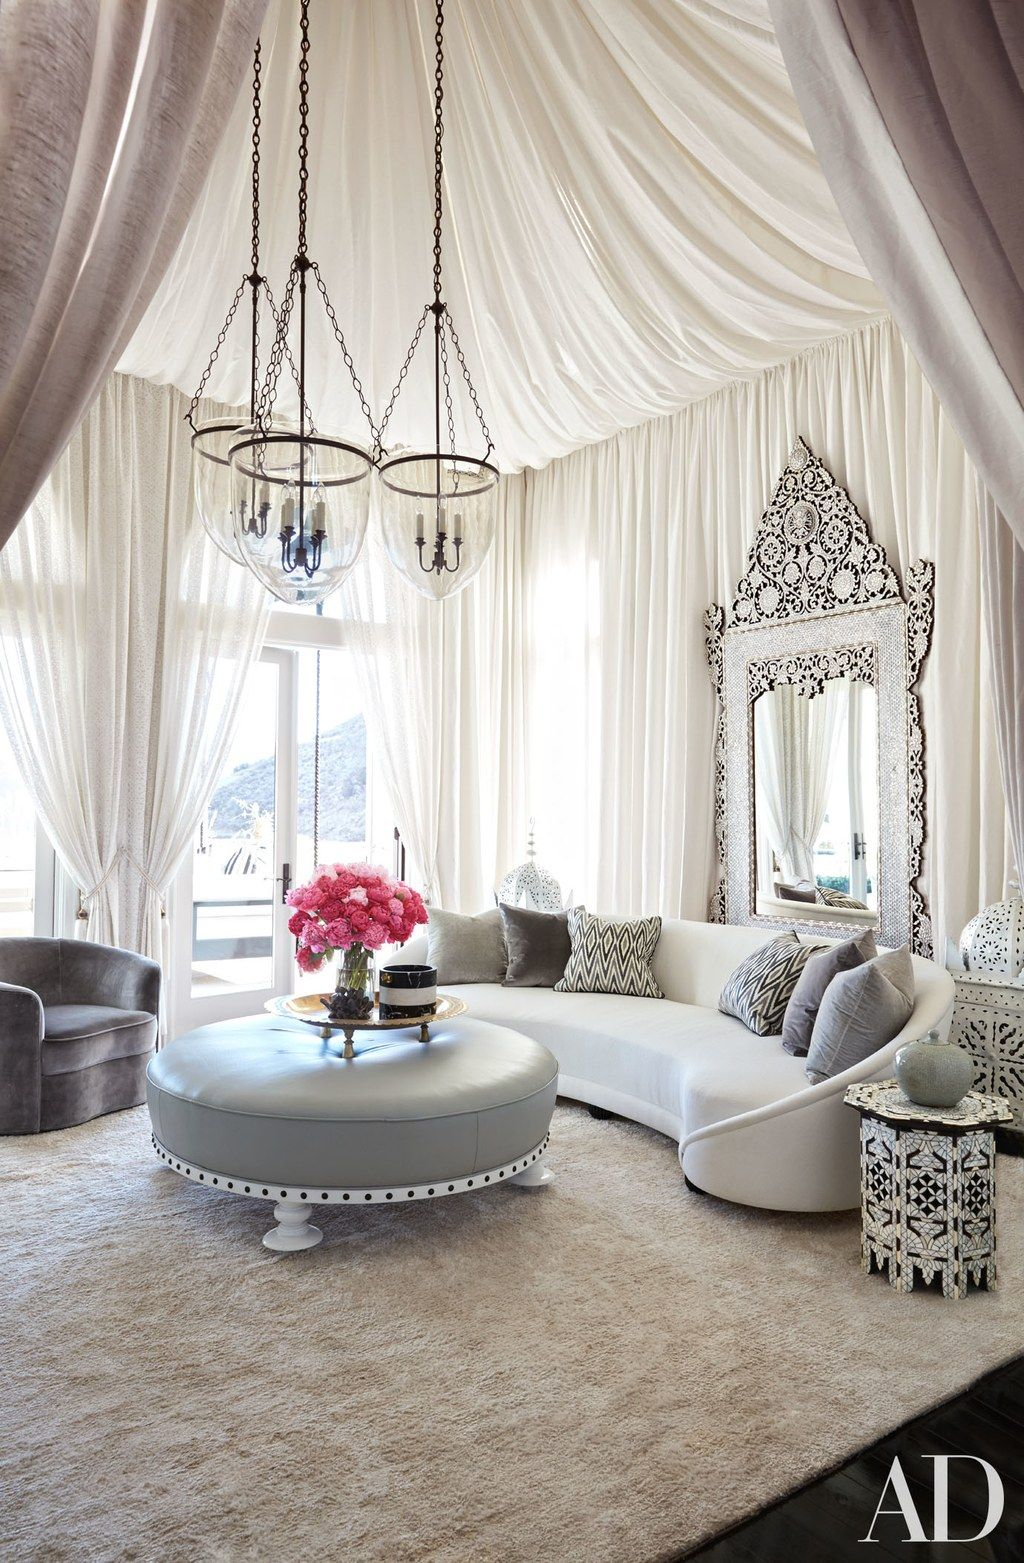 Inside Khloé and Kourtney Kardashian's Houses in California